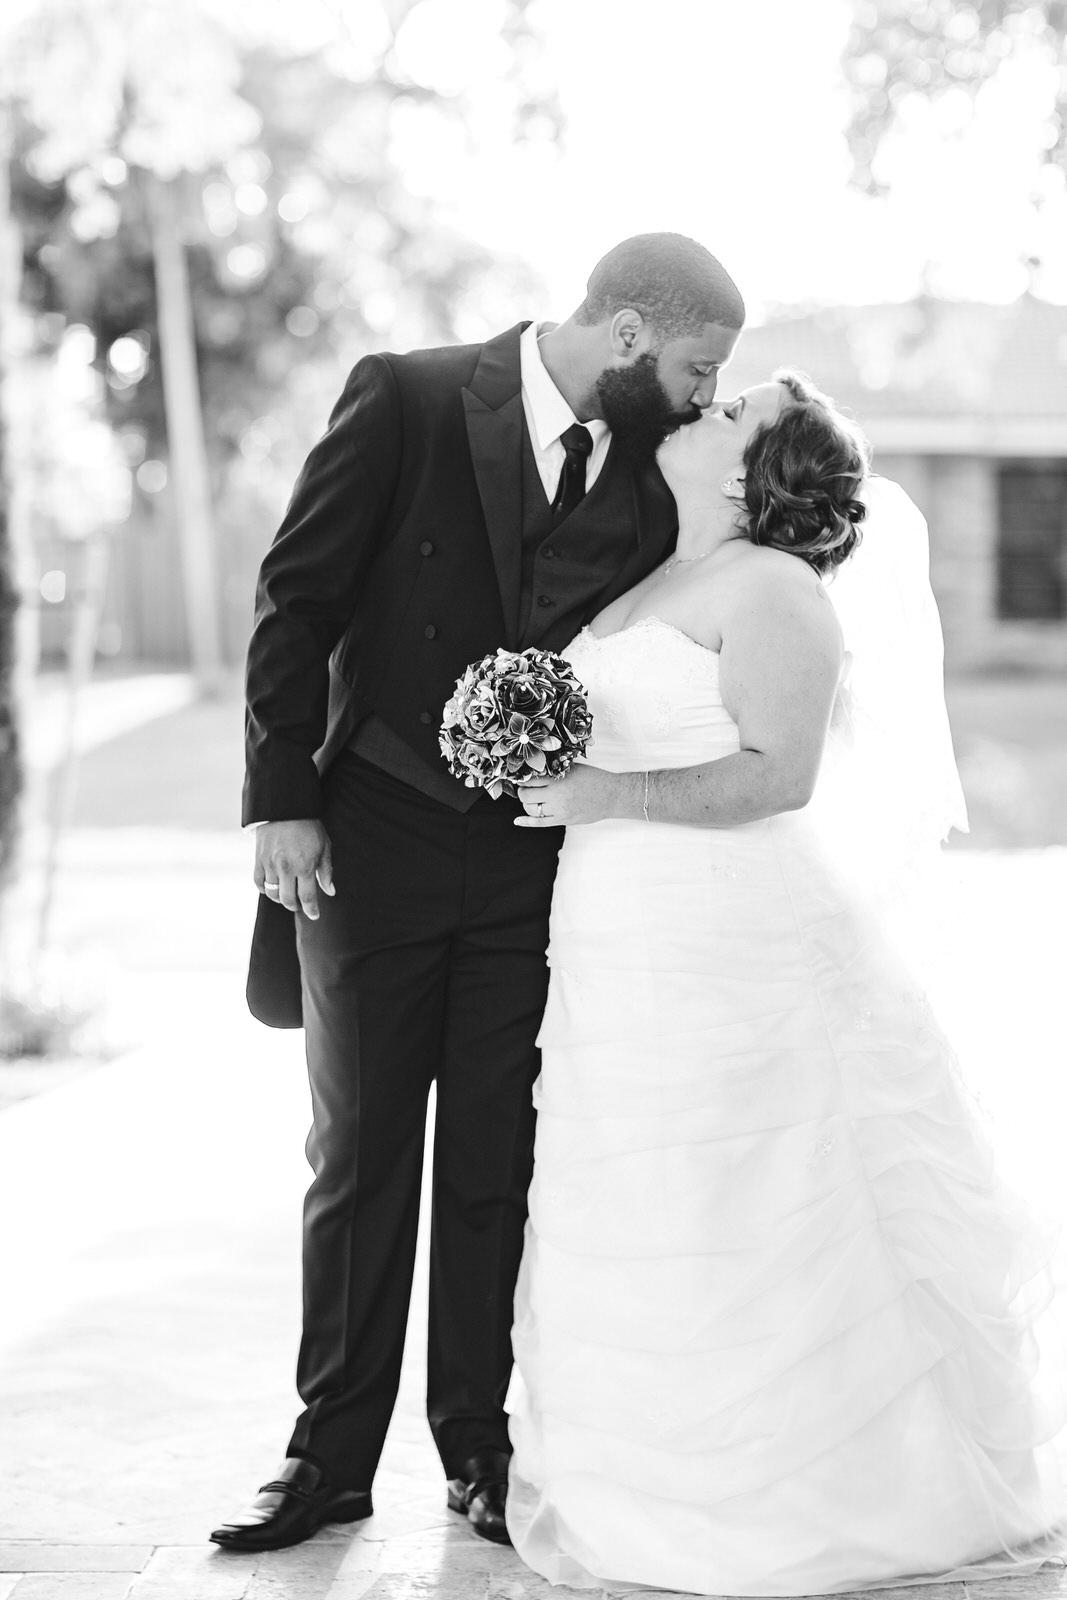 timeless-black-and-white-wedding-portait-tiny-house-photo-hollywood-florida.jpg